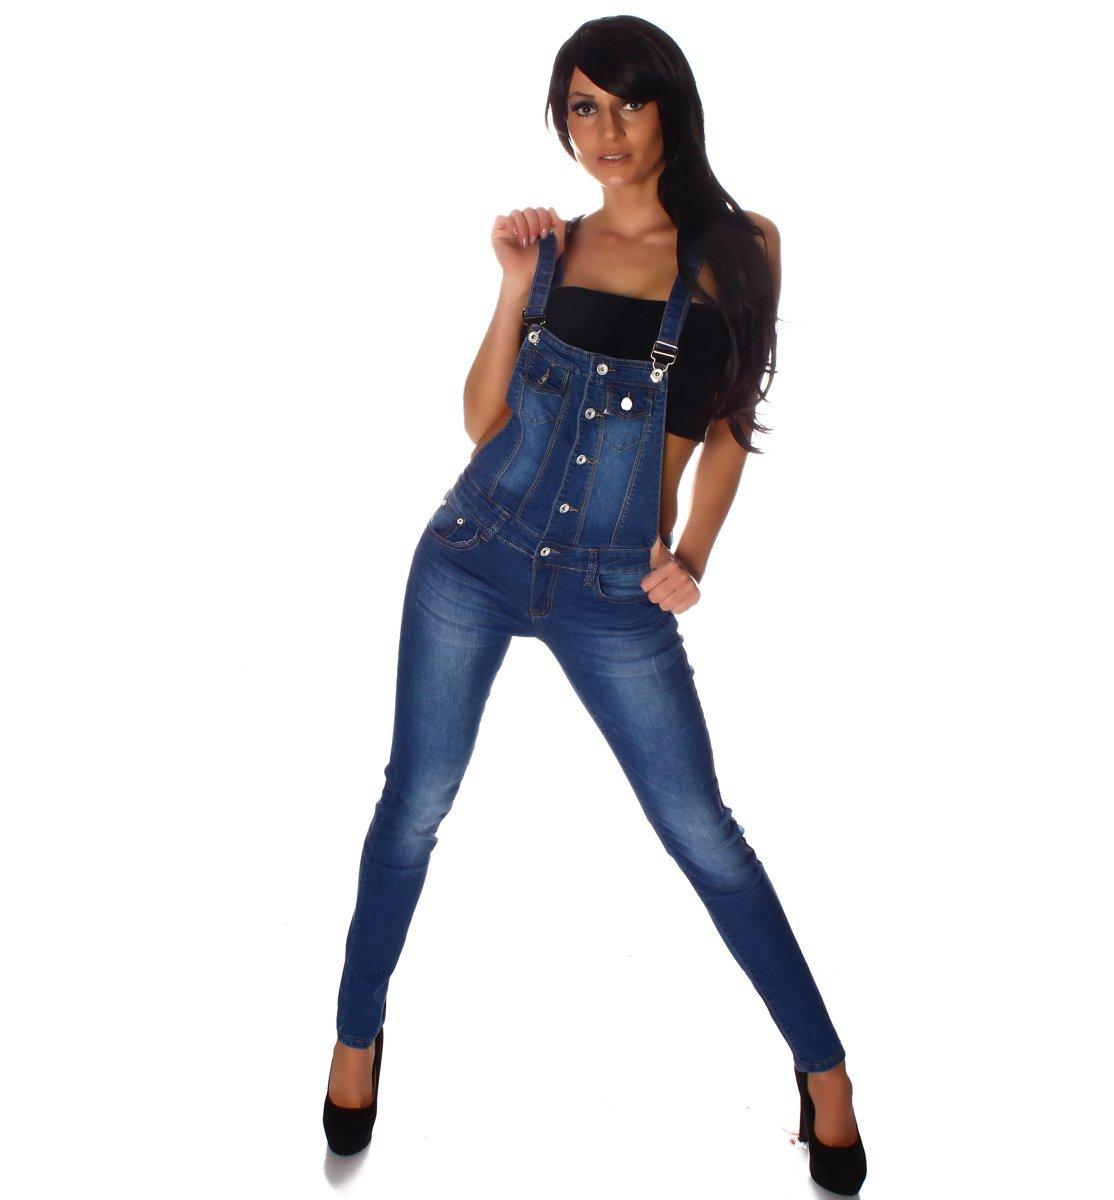 10694 Fashion4Young Damen Latzhose Hose pants mit Träger Röhren Jeans Overall Jeanshose Trägerhose